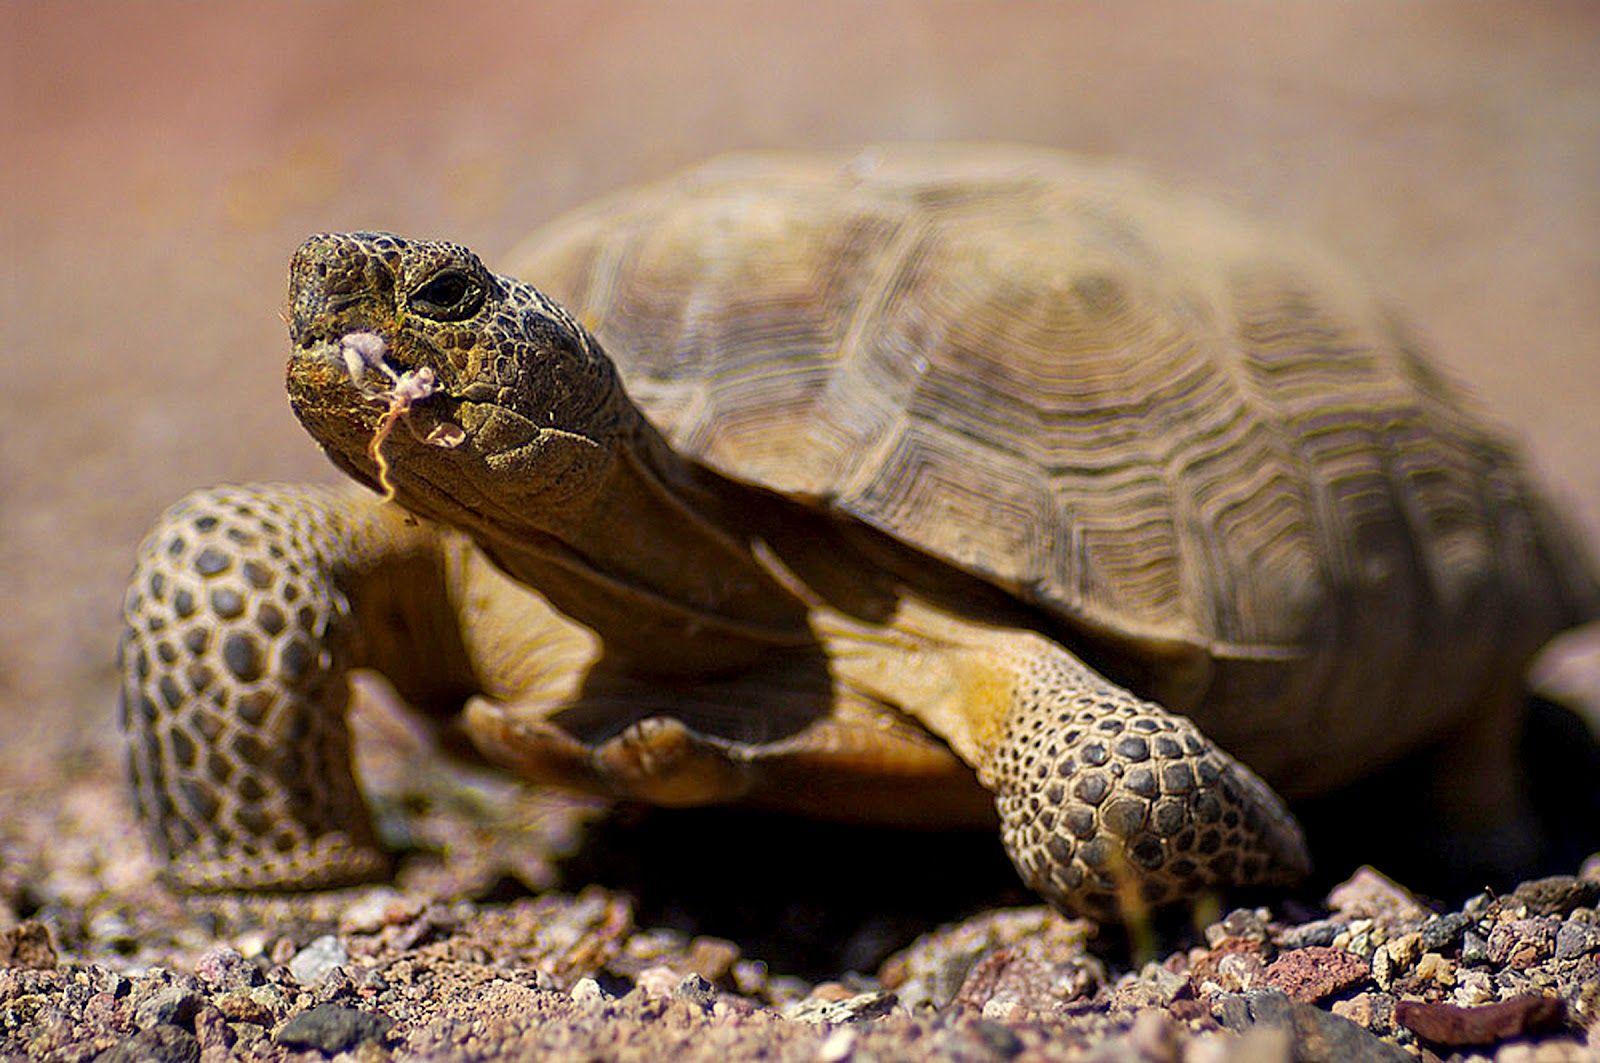 animals of the desert the desert tortoise is a herbivore